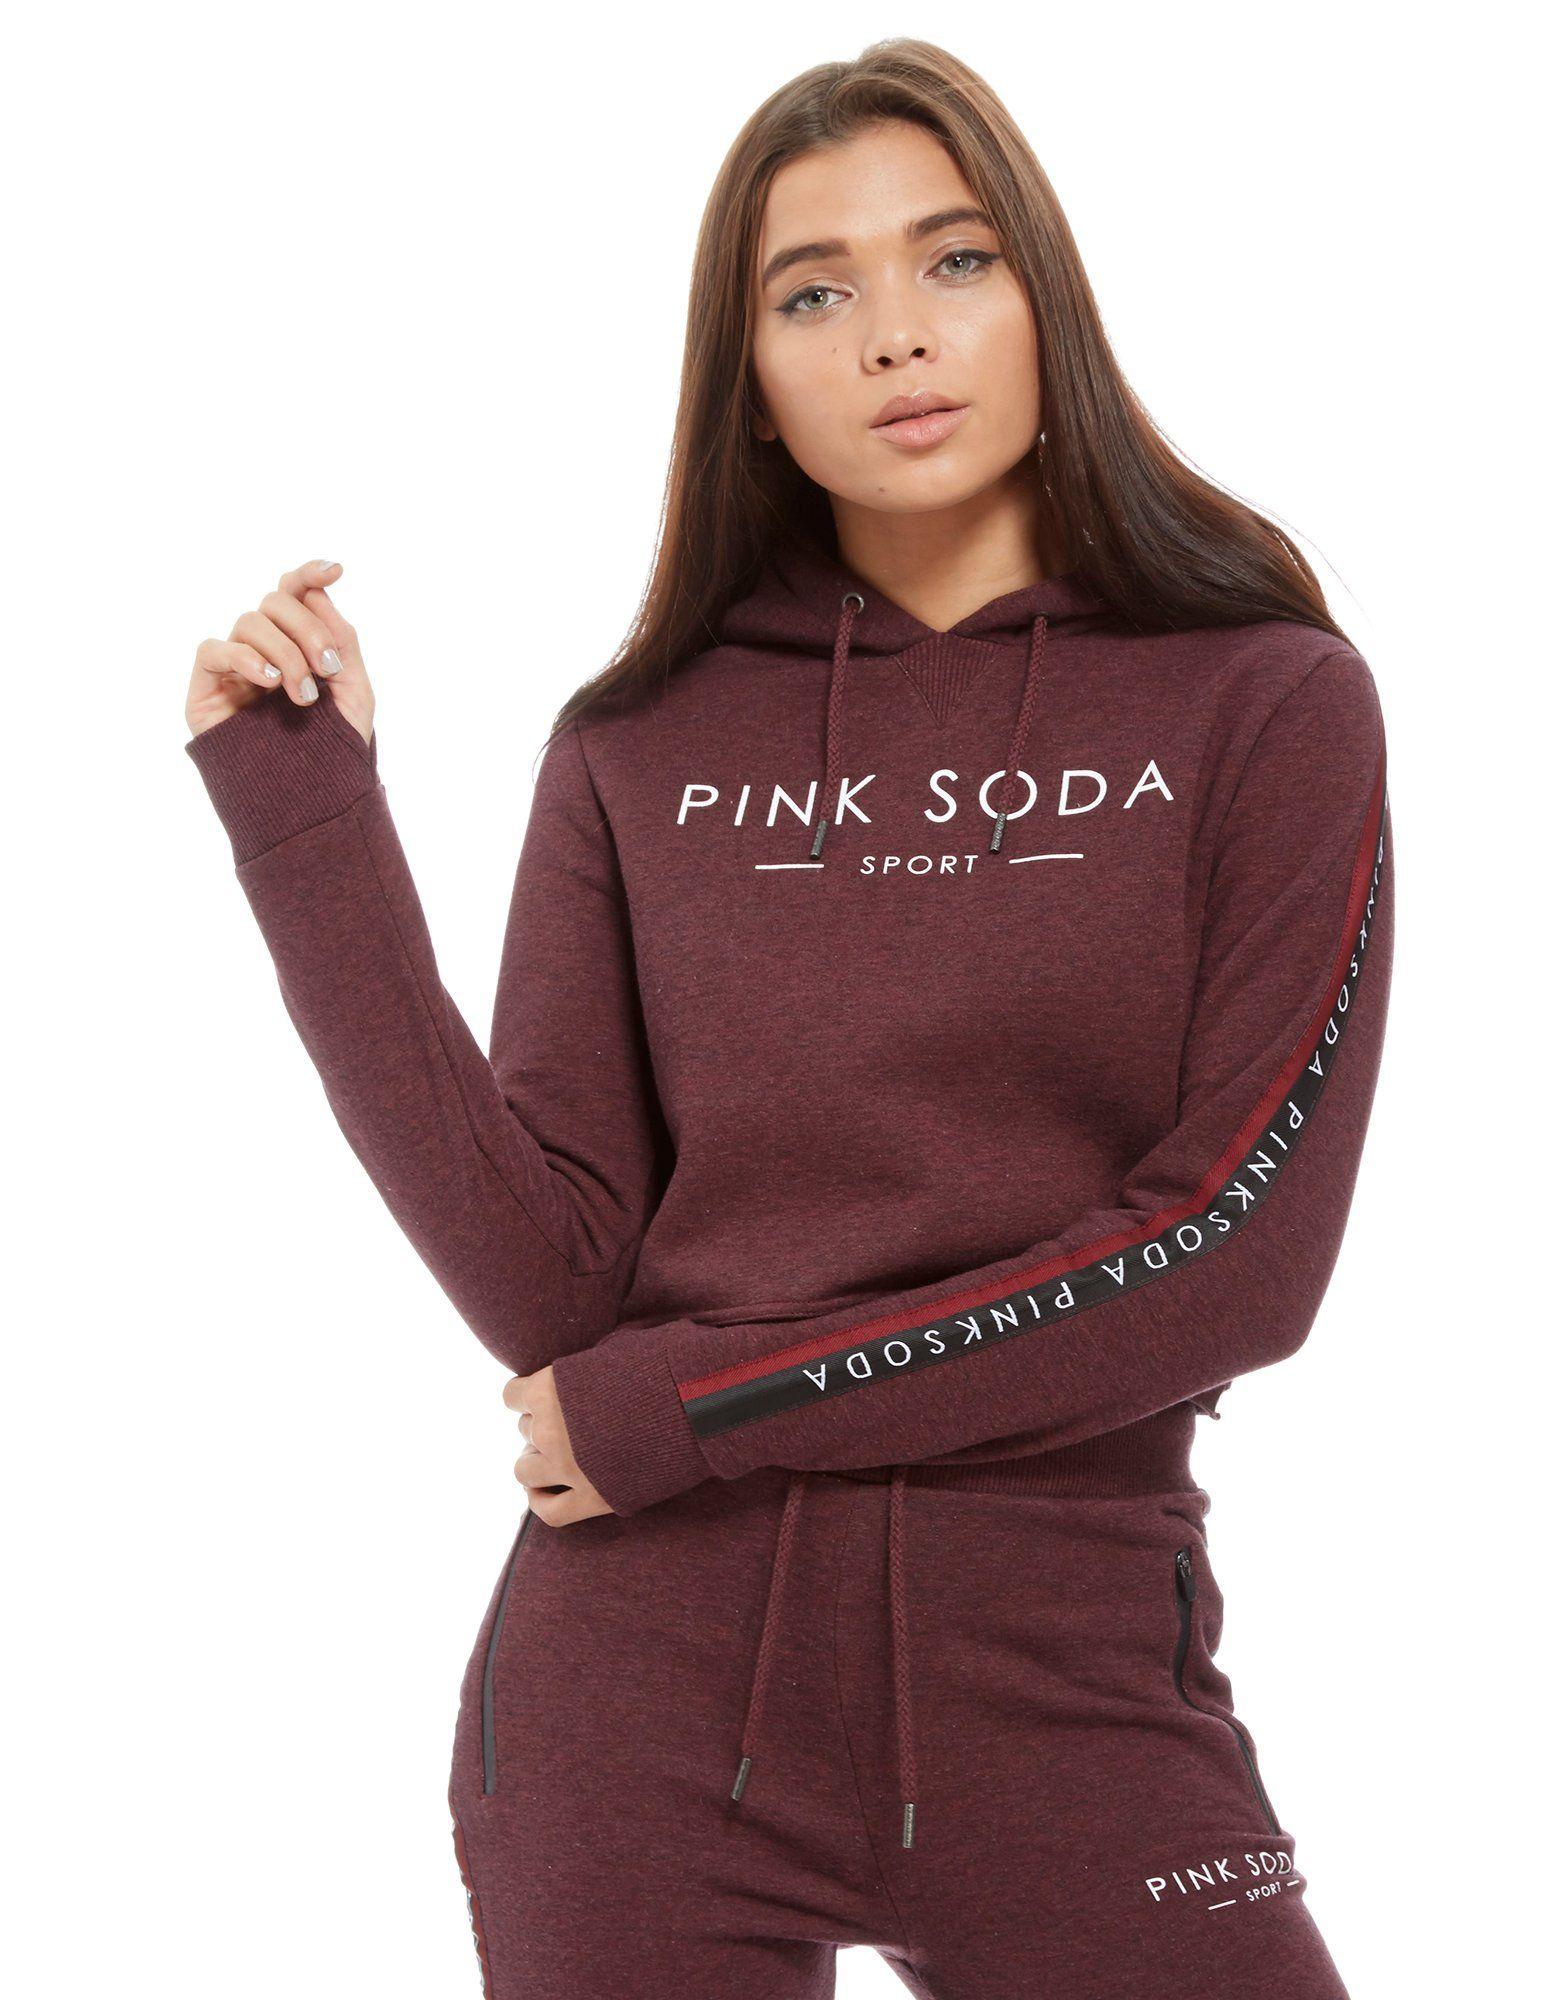 pink soda sport cropped overhead hoodie jd sports